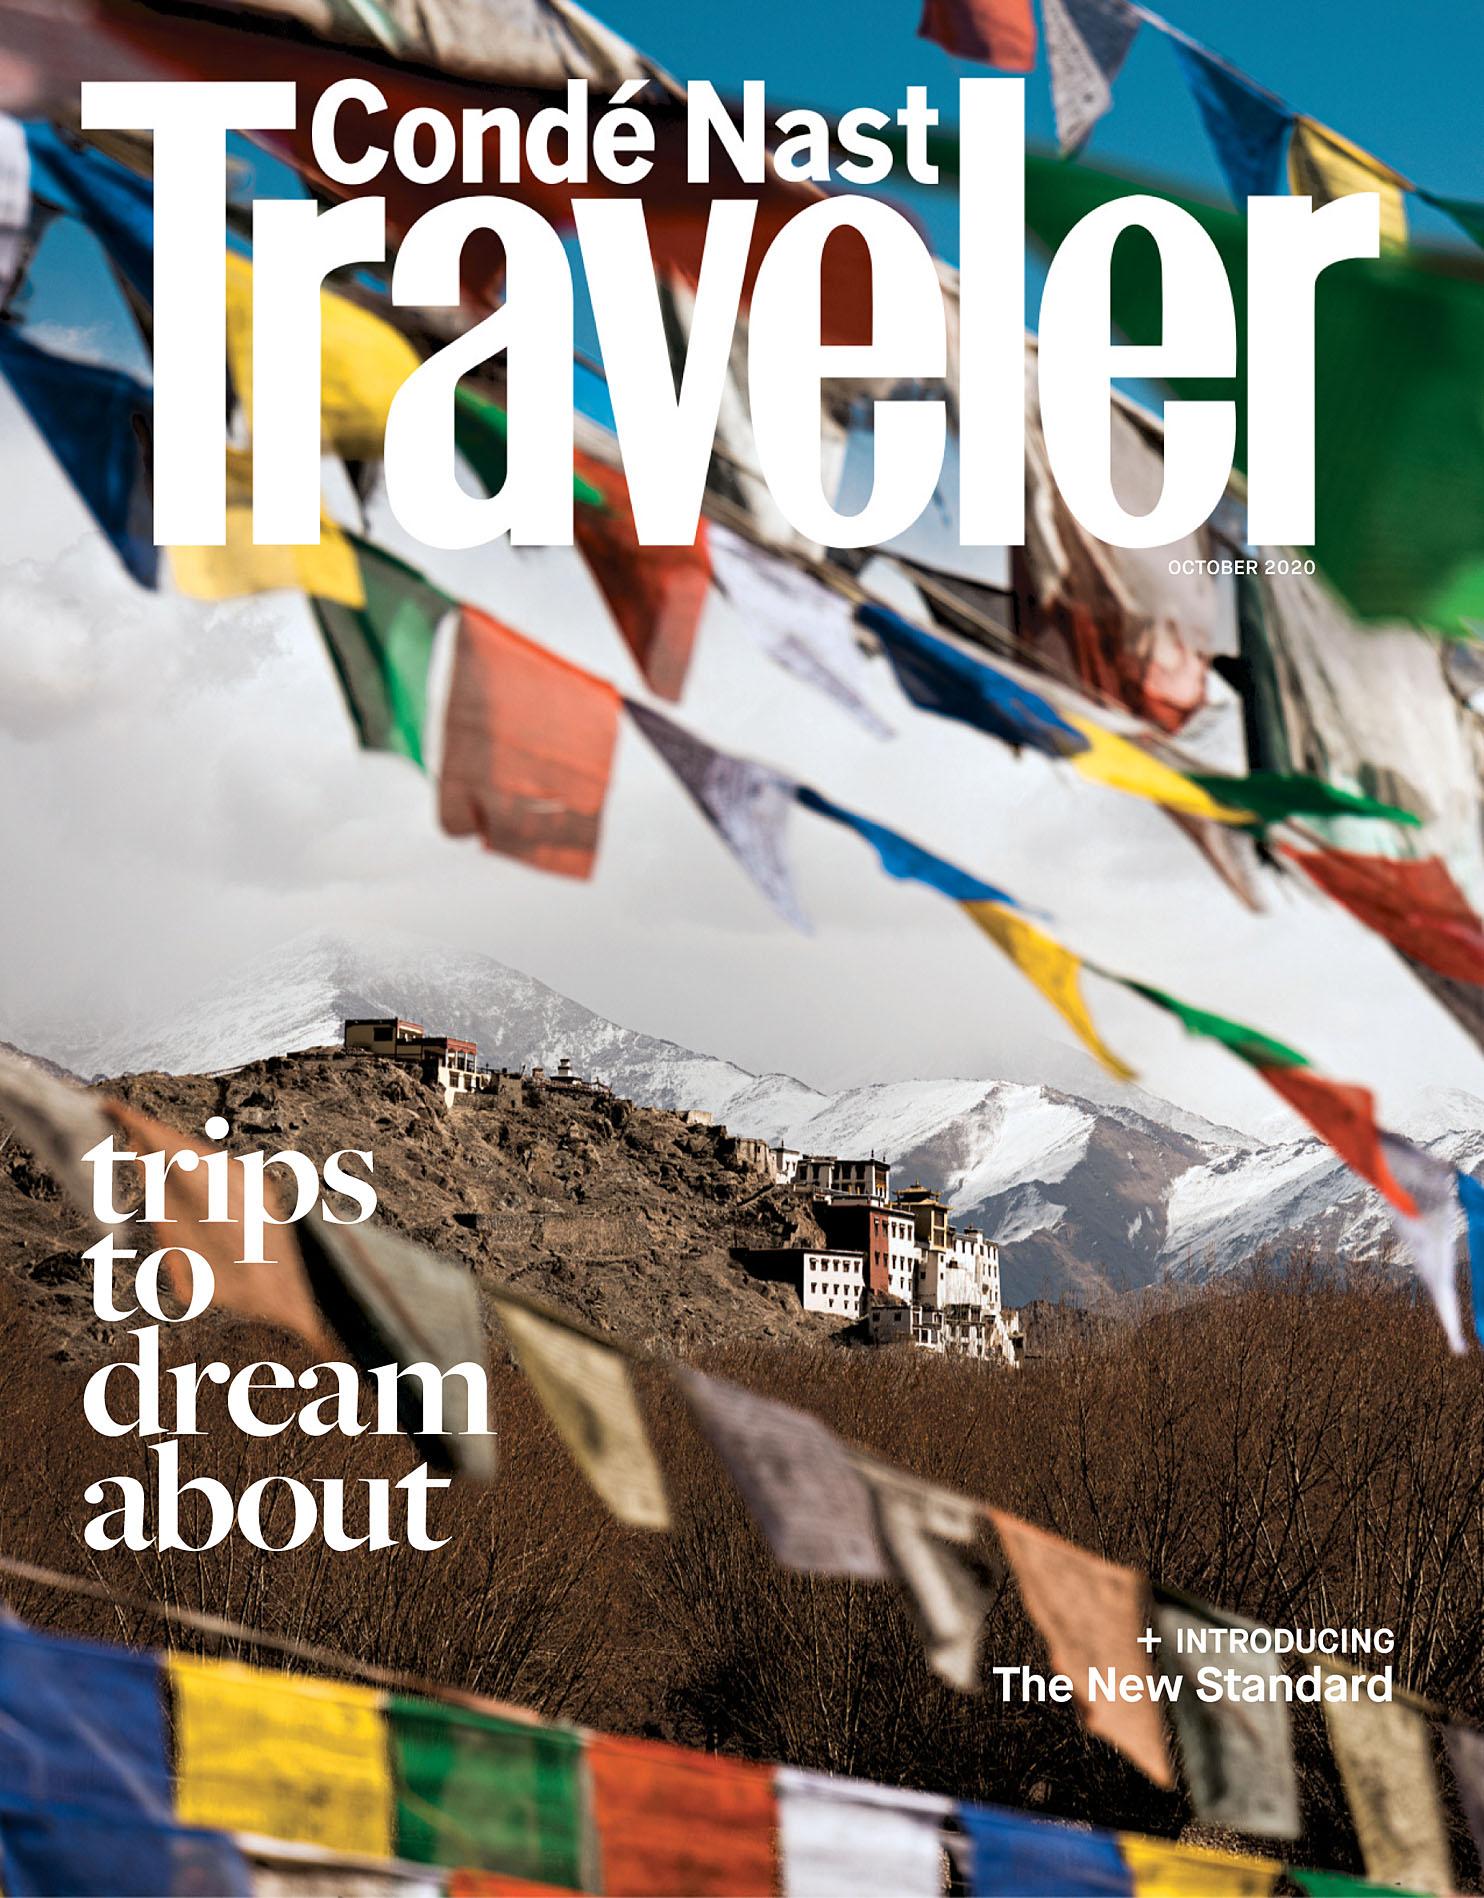 Conde Nast Traveler 2020-10 01.jpg